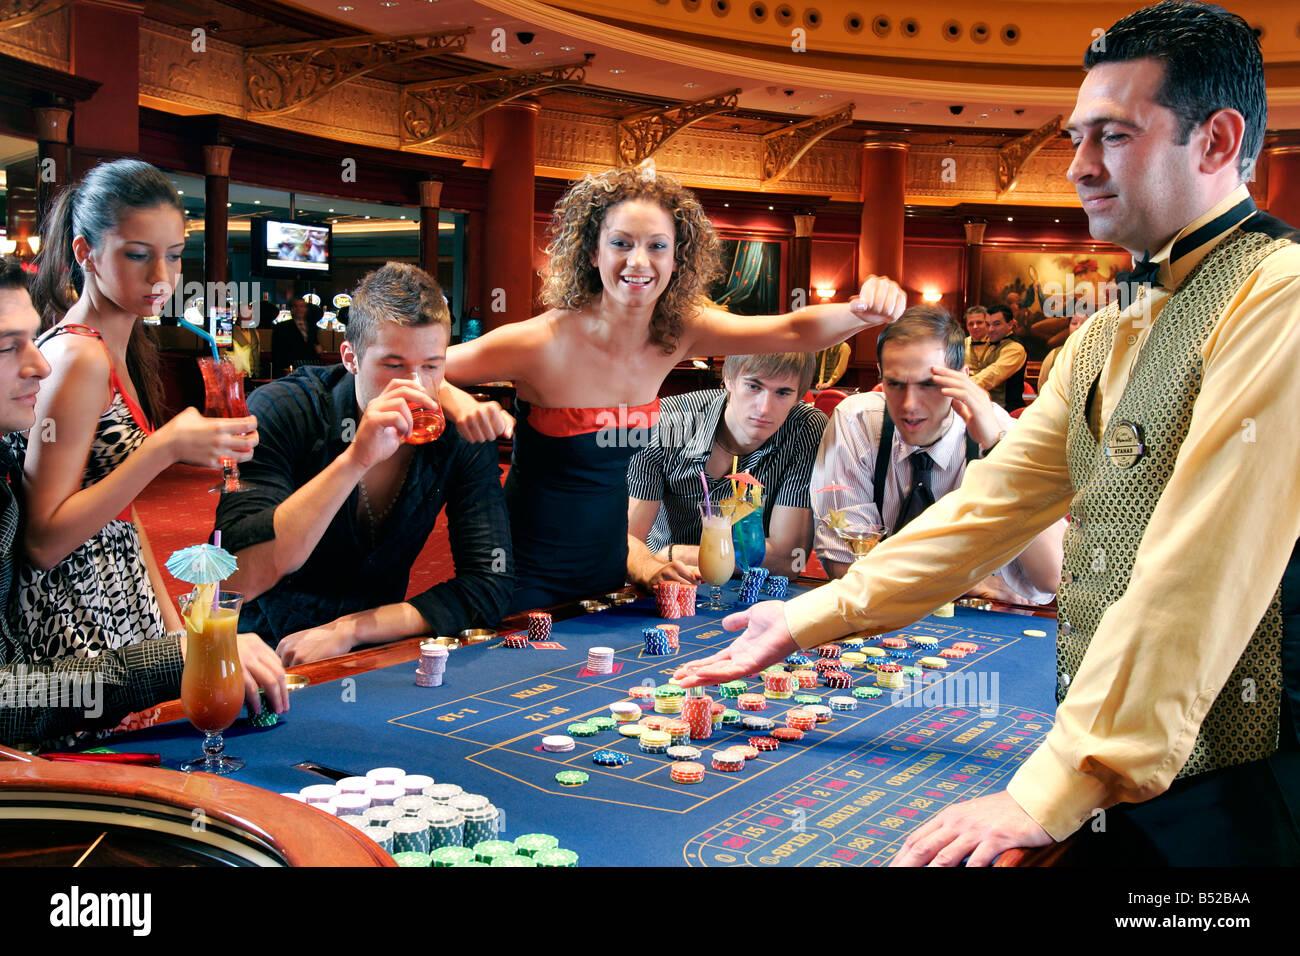 Casino gamblers bonus boscasino.com casino great online